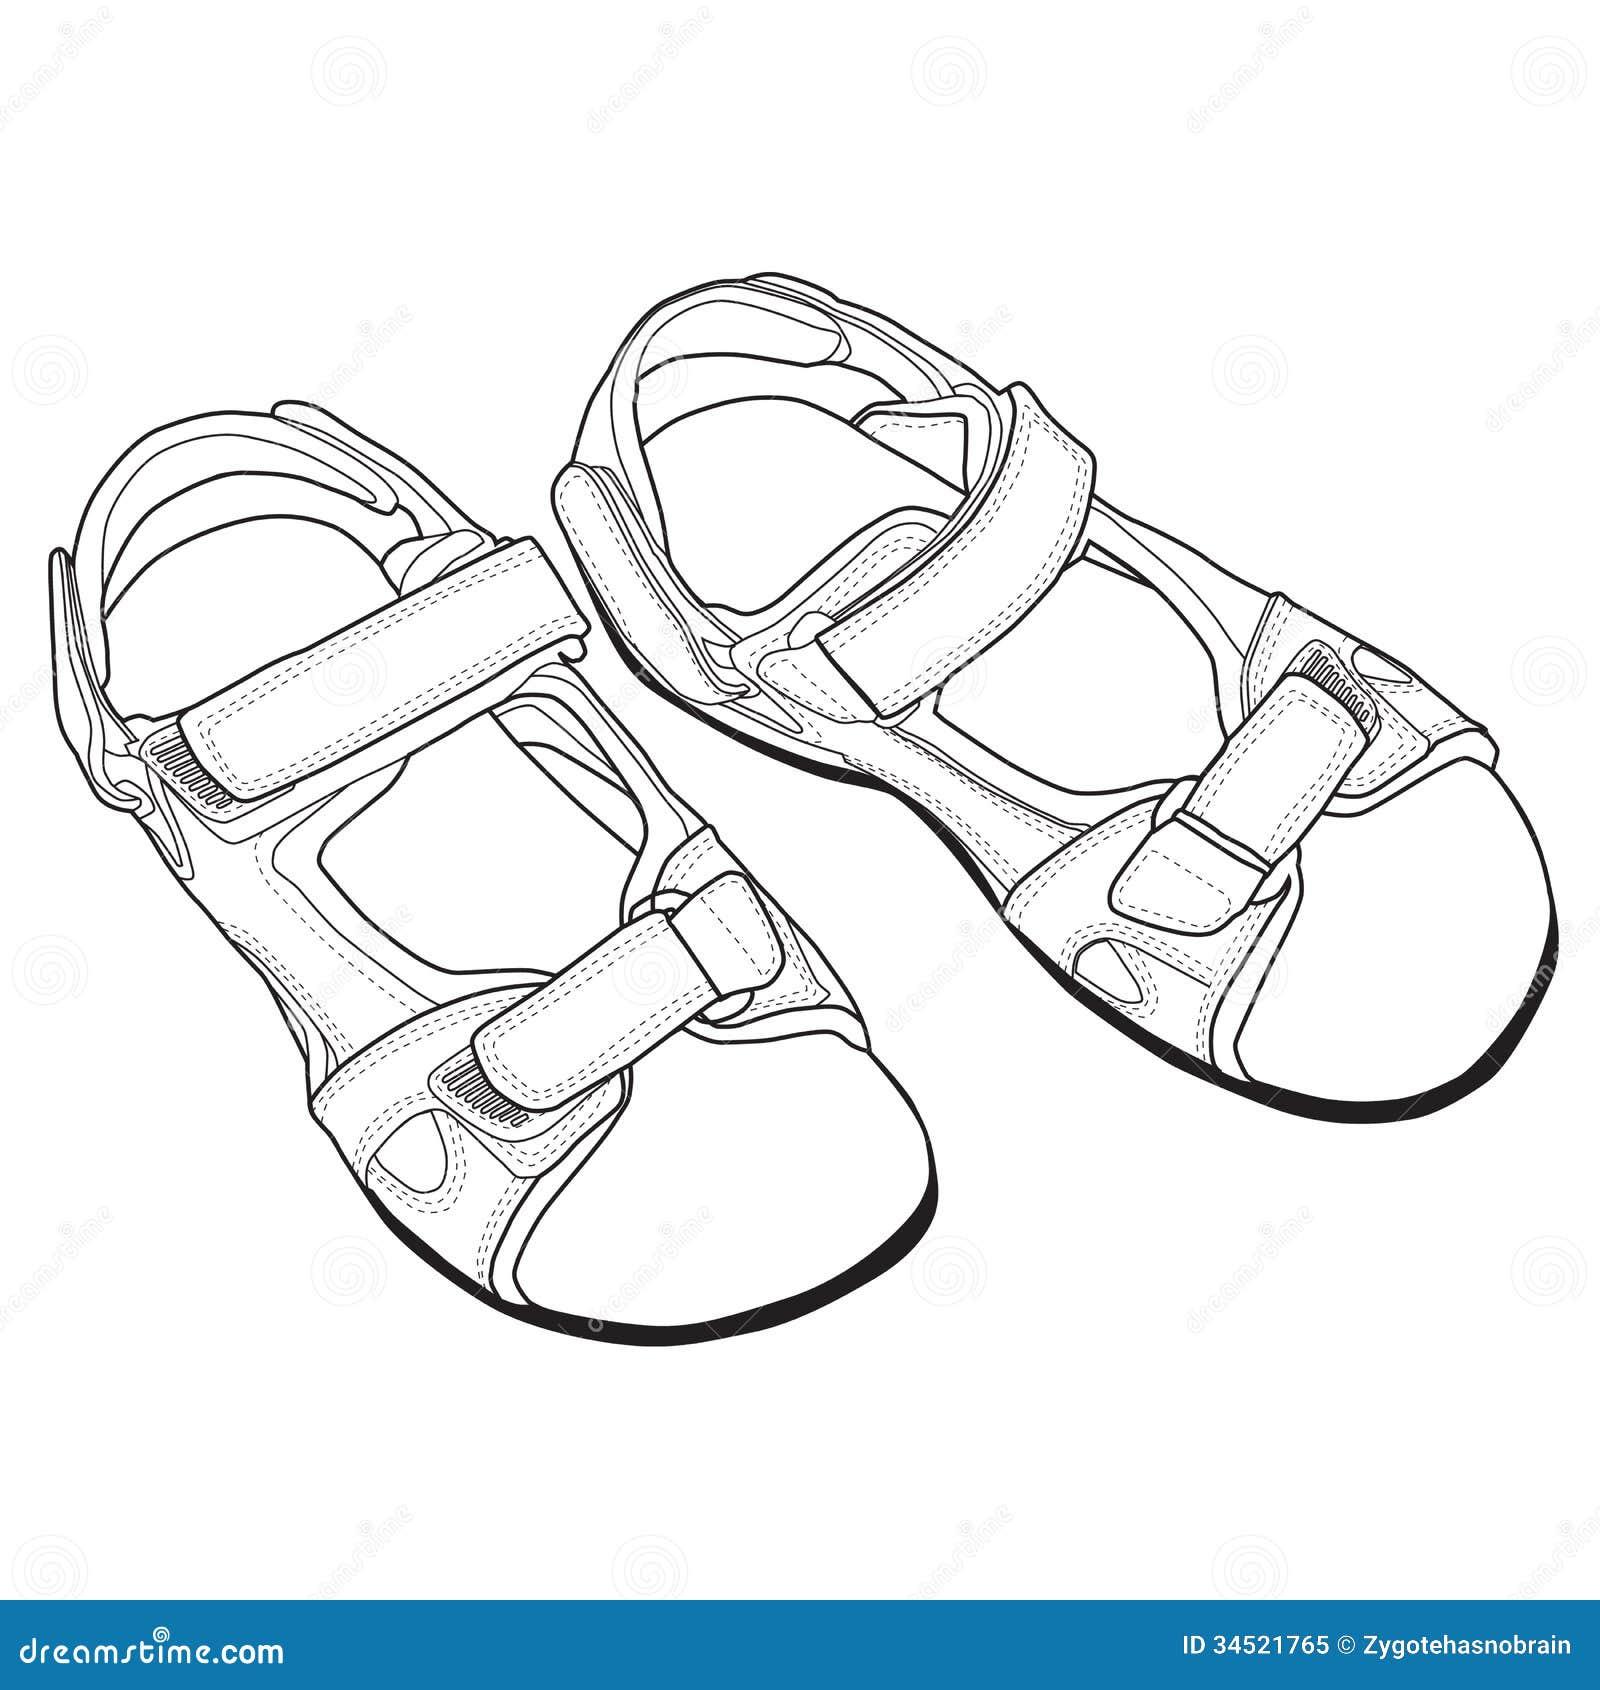 Line Art Vector Illustrator : Vector line art of sandals royalty free stock photo